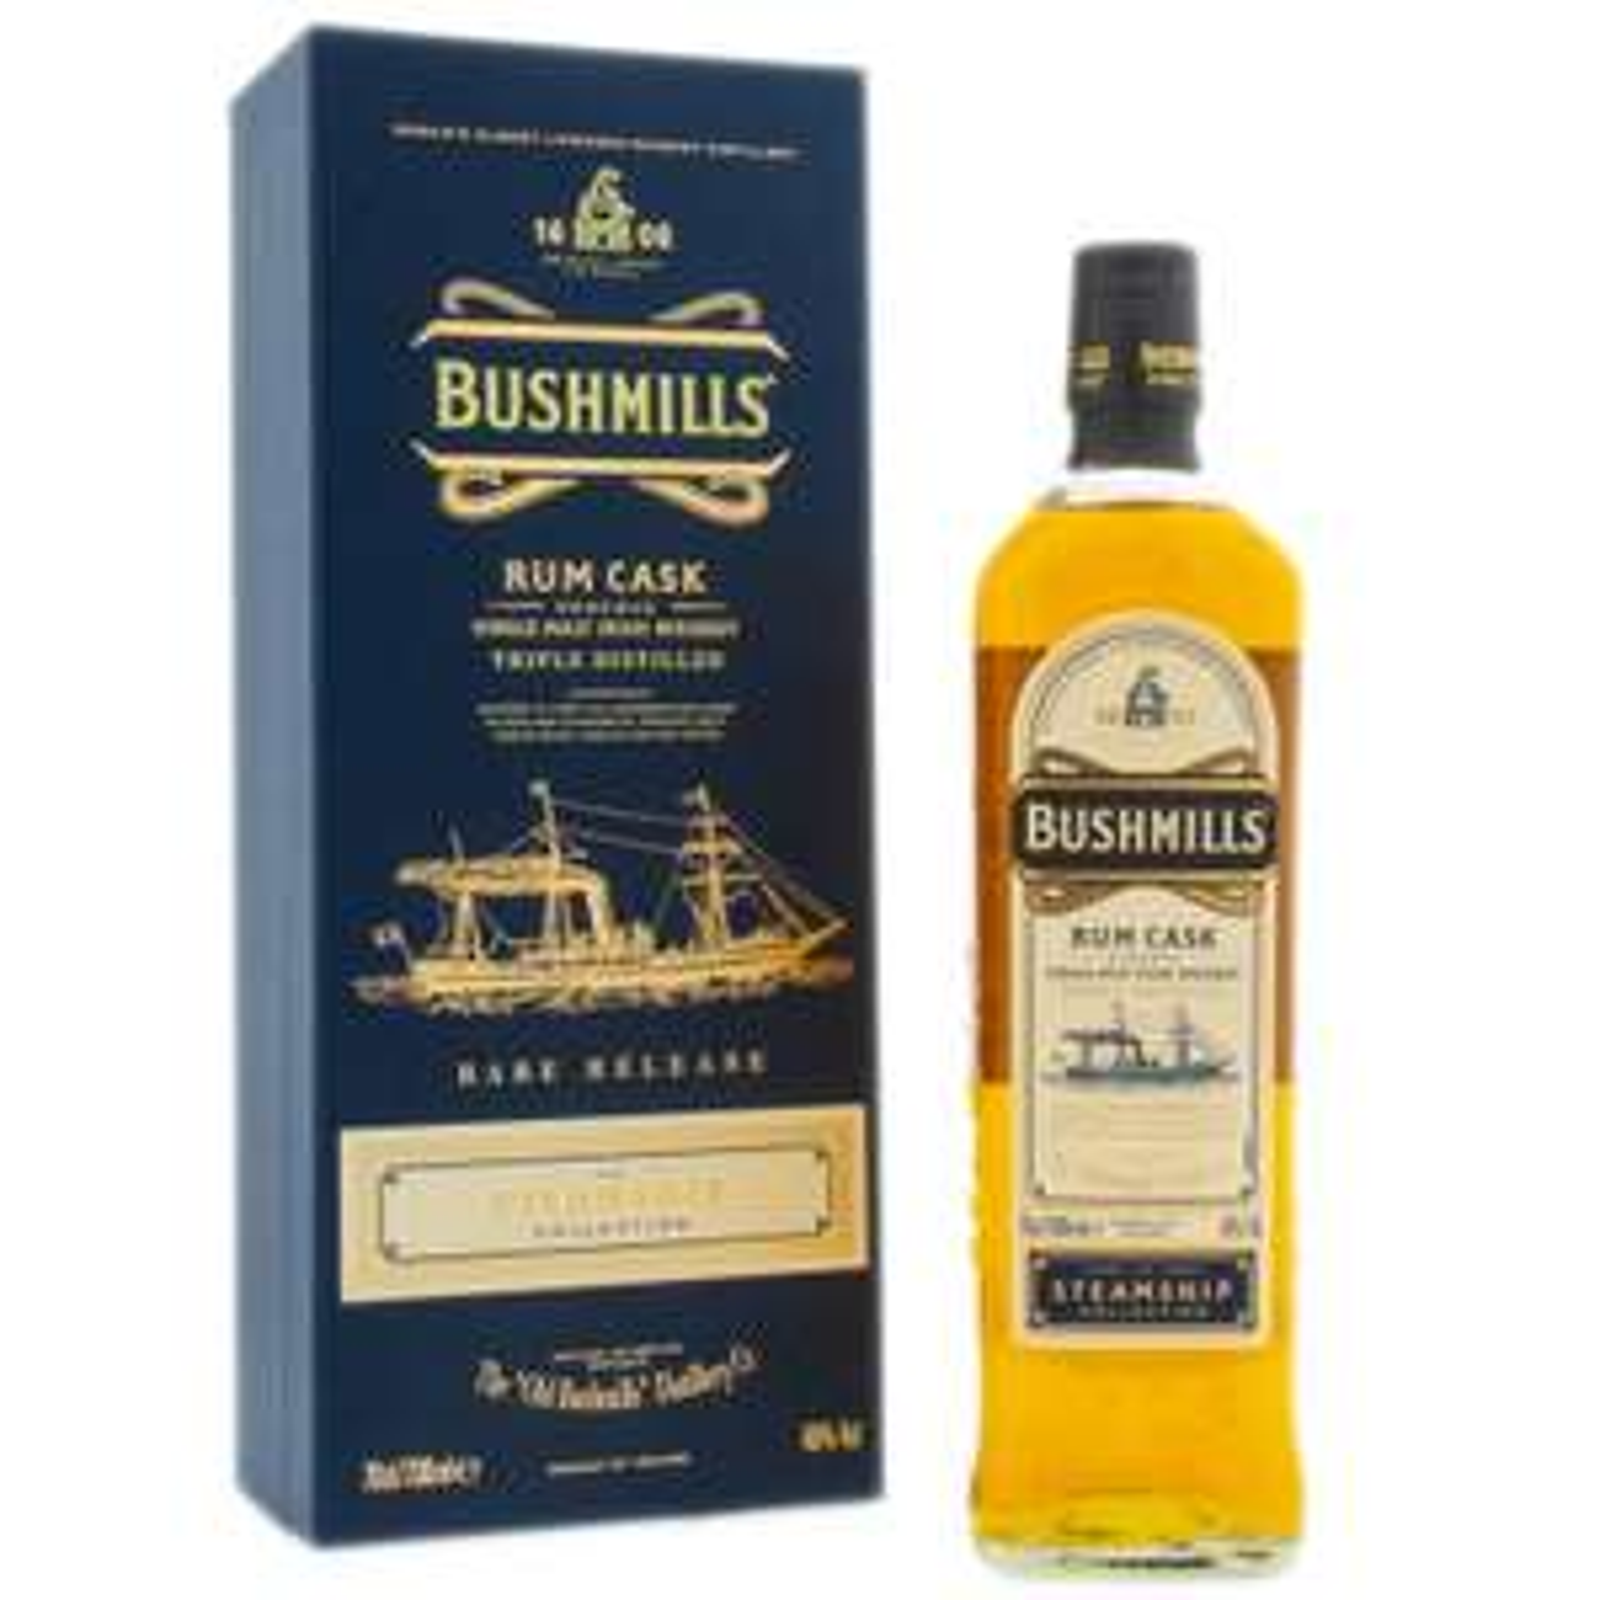 Bushmills Steamship Collection Rum Cask. Single Malt Irish Whiskey